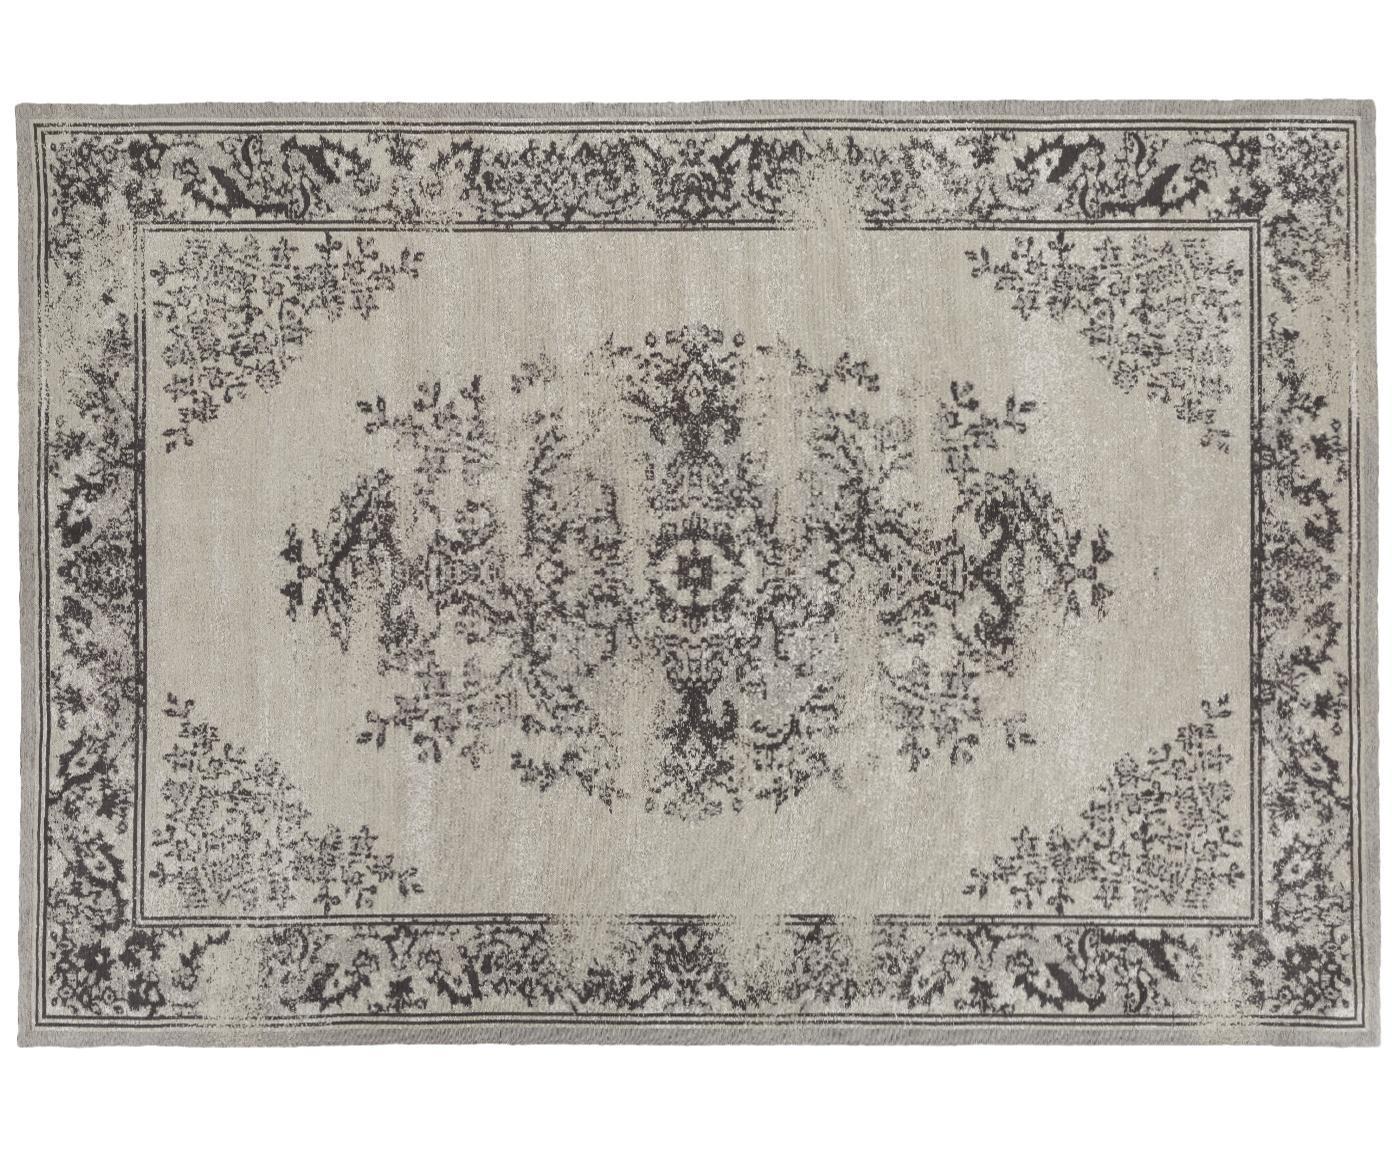 Chenille vloerkleed Touch, Bovenzijde: 95% katoen, 5% polyester, Onderzijde: 100% katoen, Grijs, 120 x 180 cm